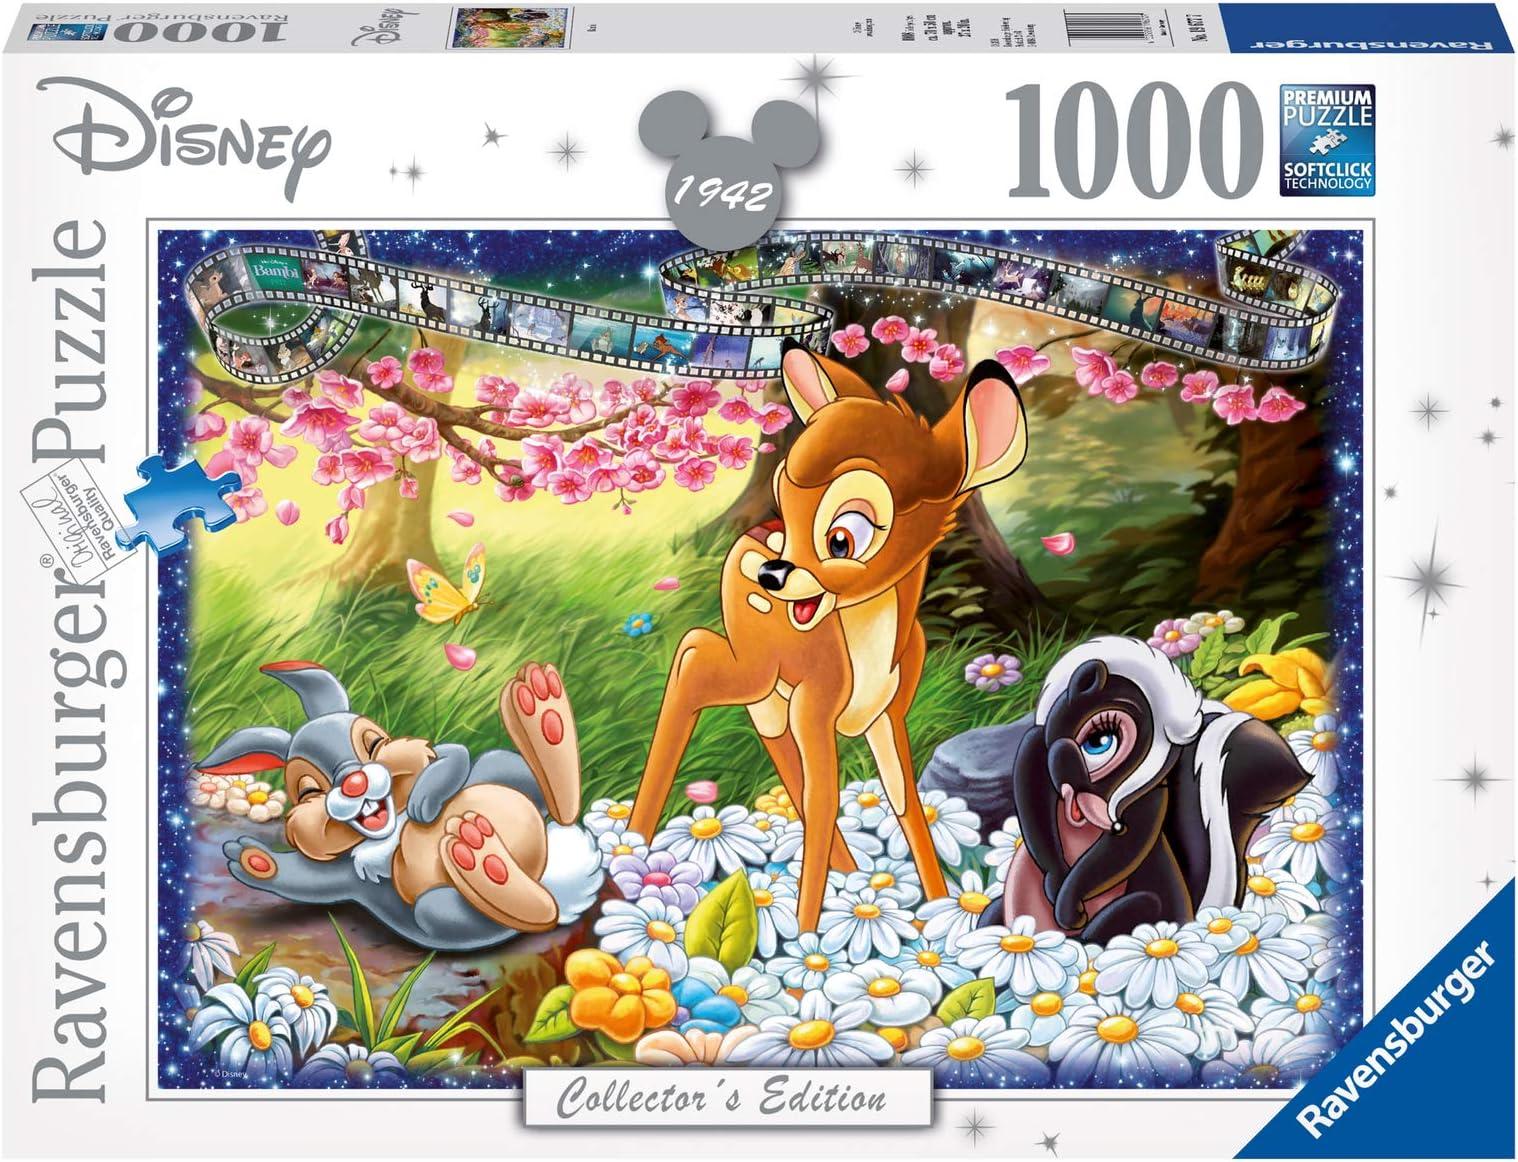 19677 Ravensburger Bambi Disney Collector/'s Edition Jigsaw Puzzle 1000pcs